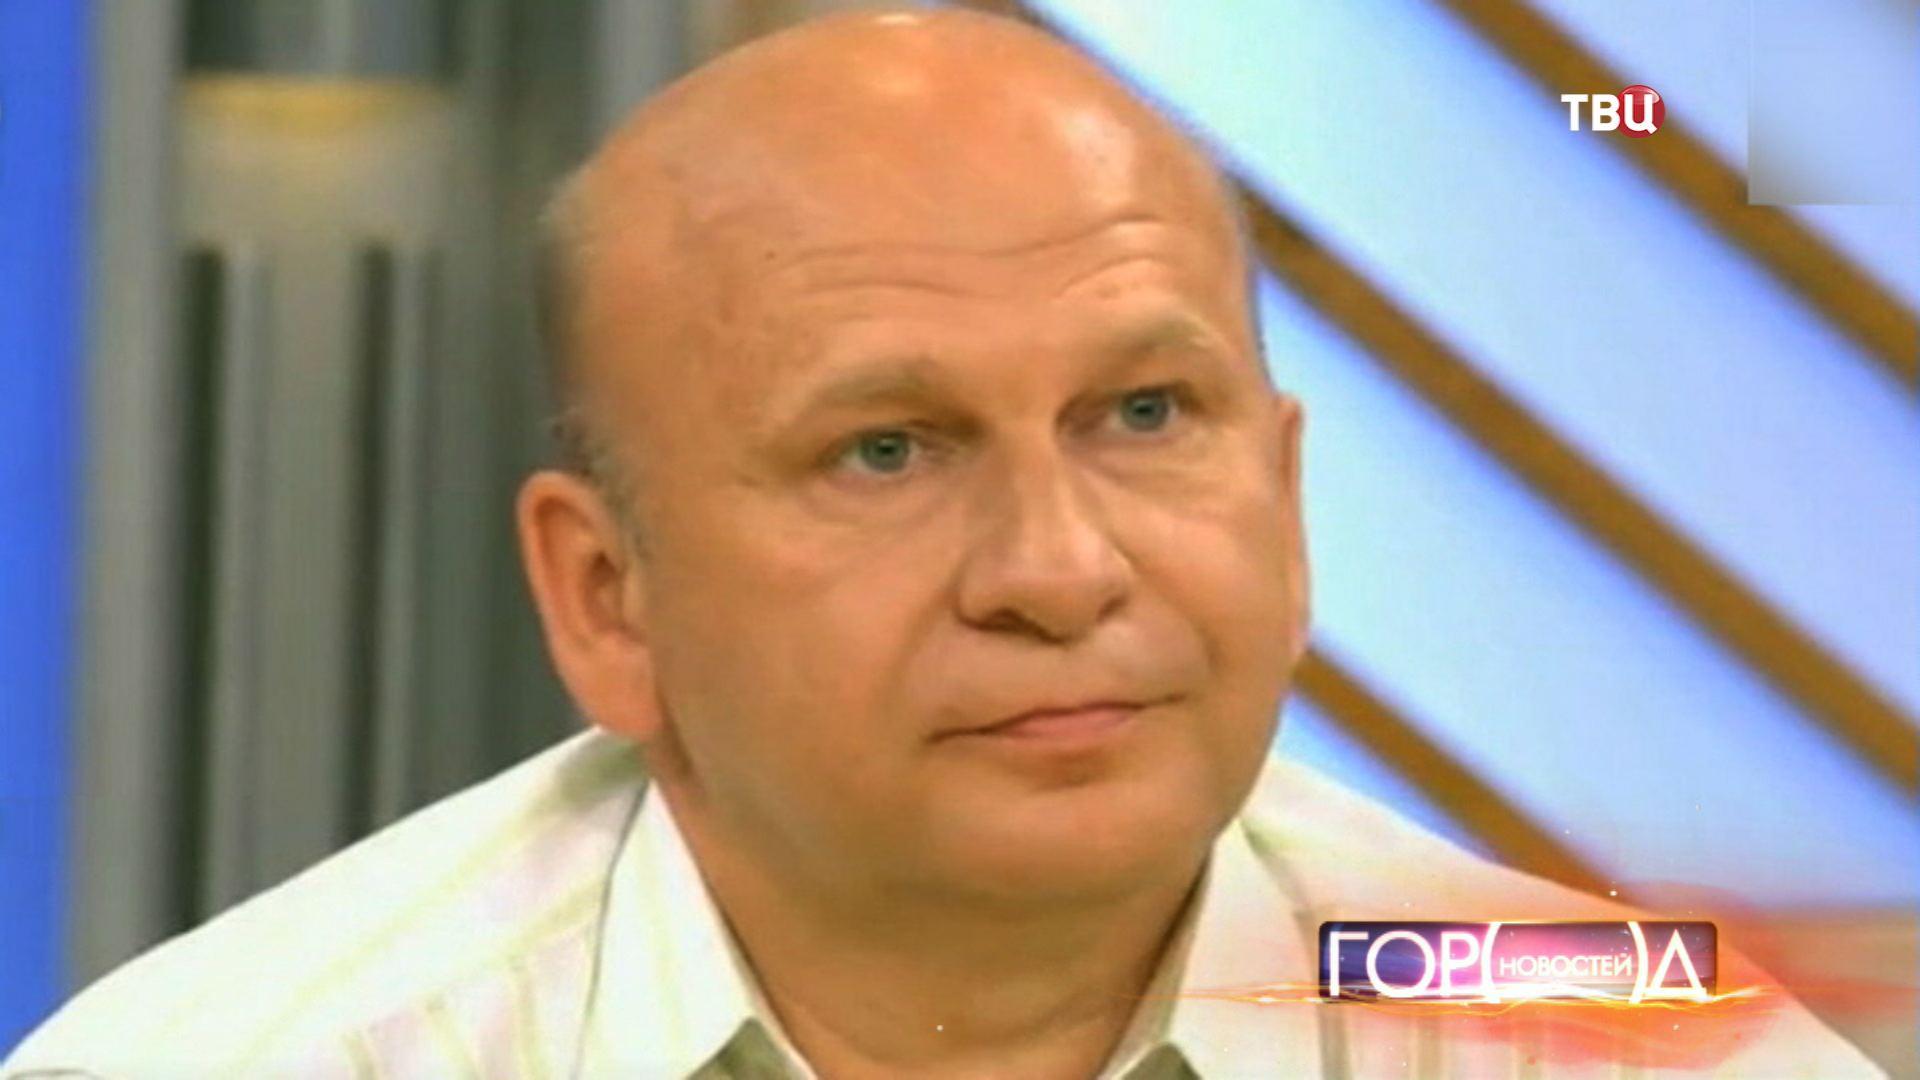 Врач-реаниматолог Валерий Лукьянов